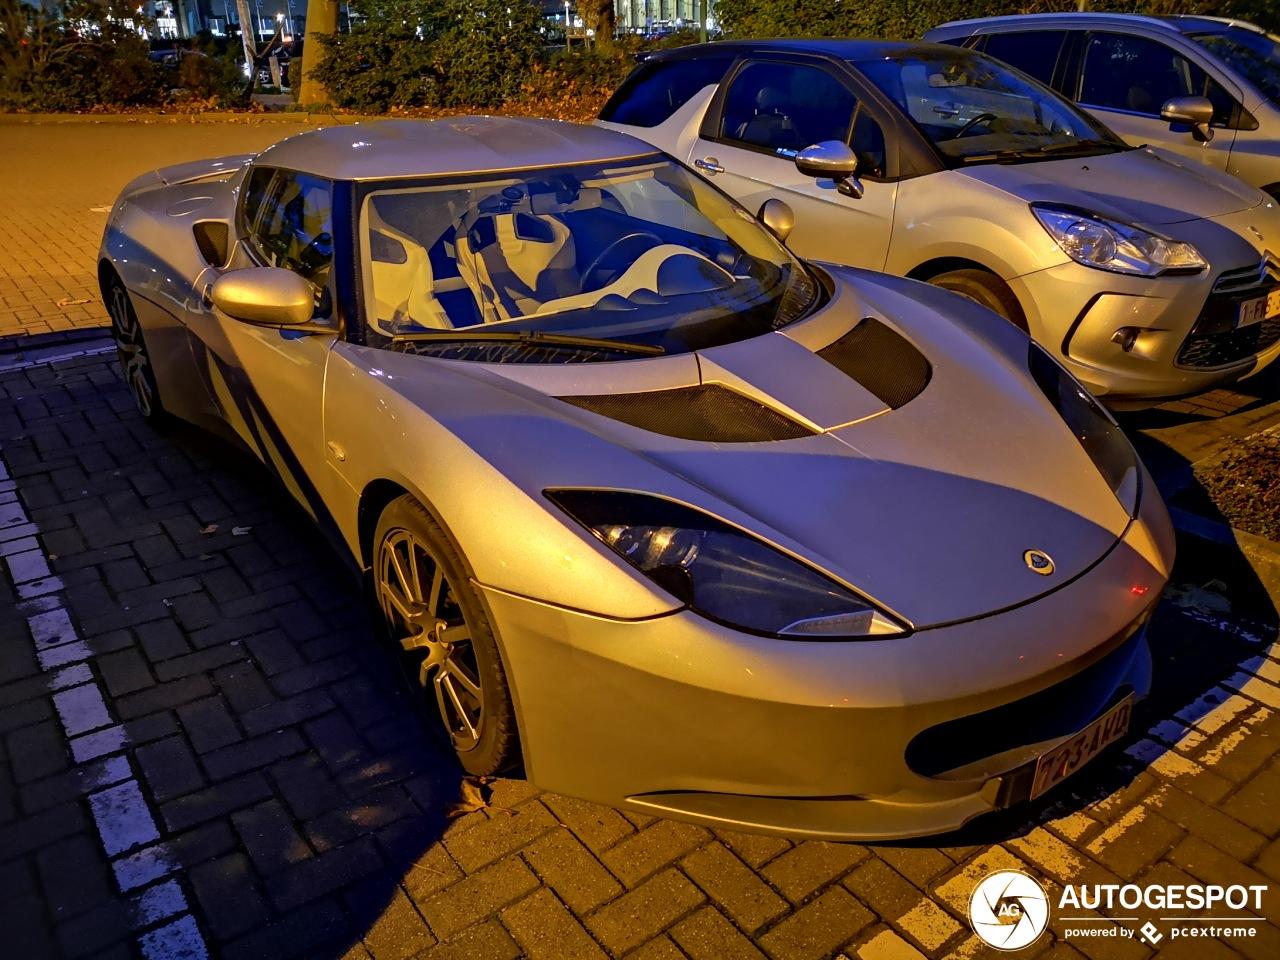 Lotus Evora - 17 November 2019 - Autogespot